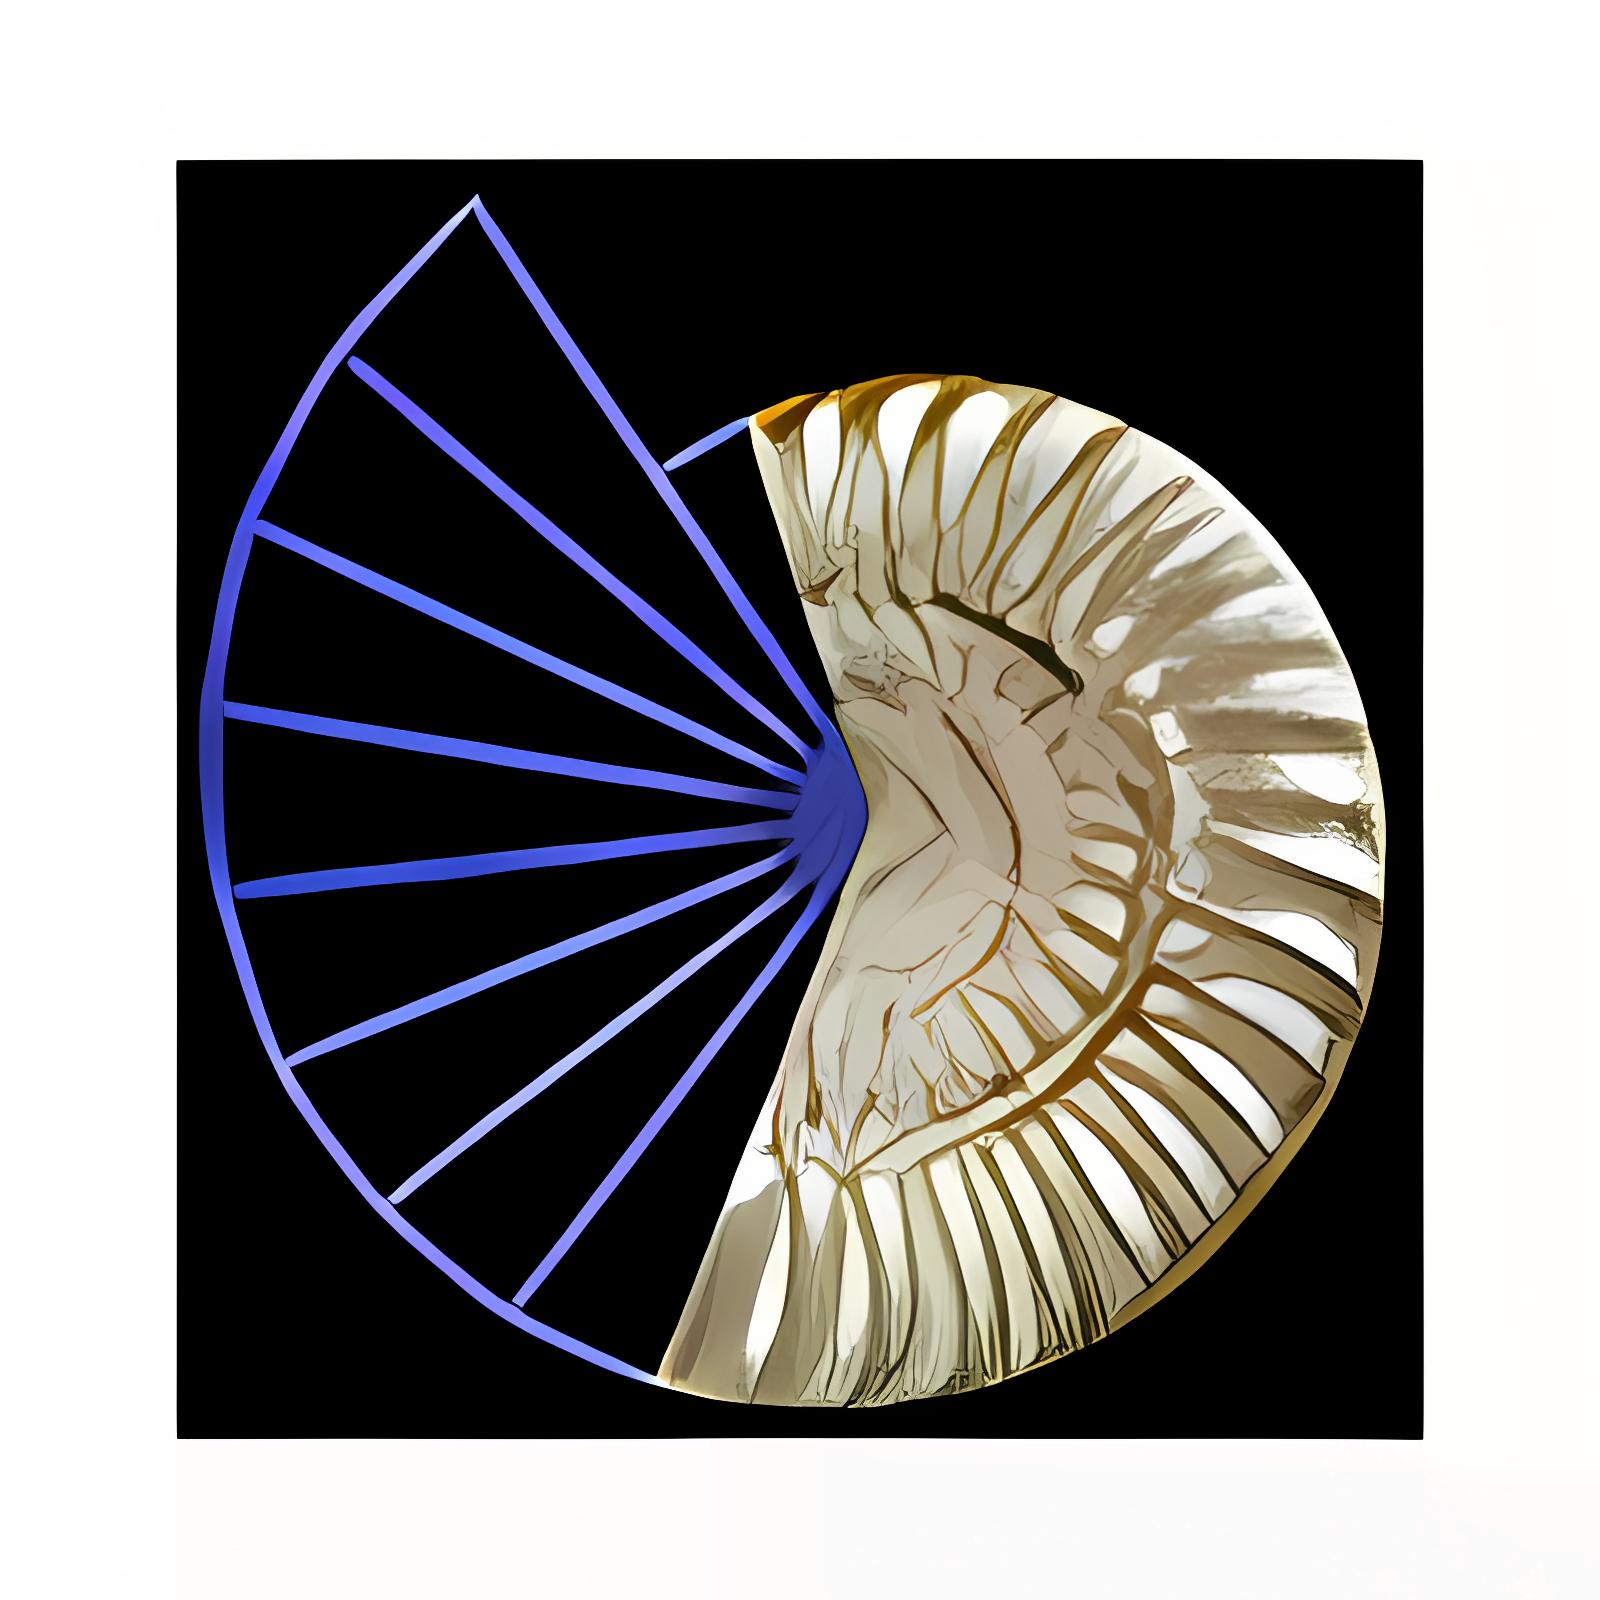 Zirkel und Lineal